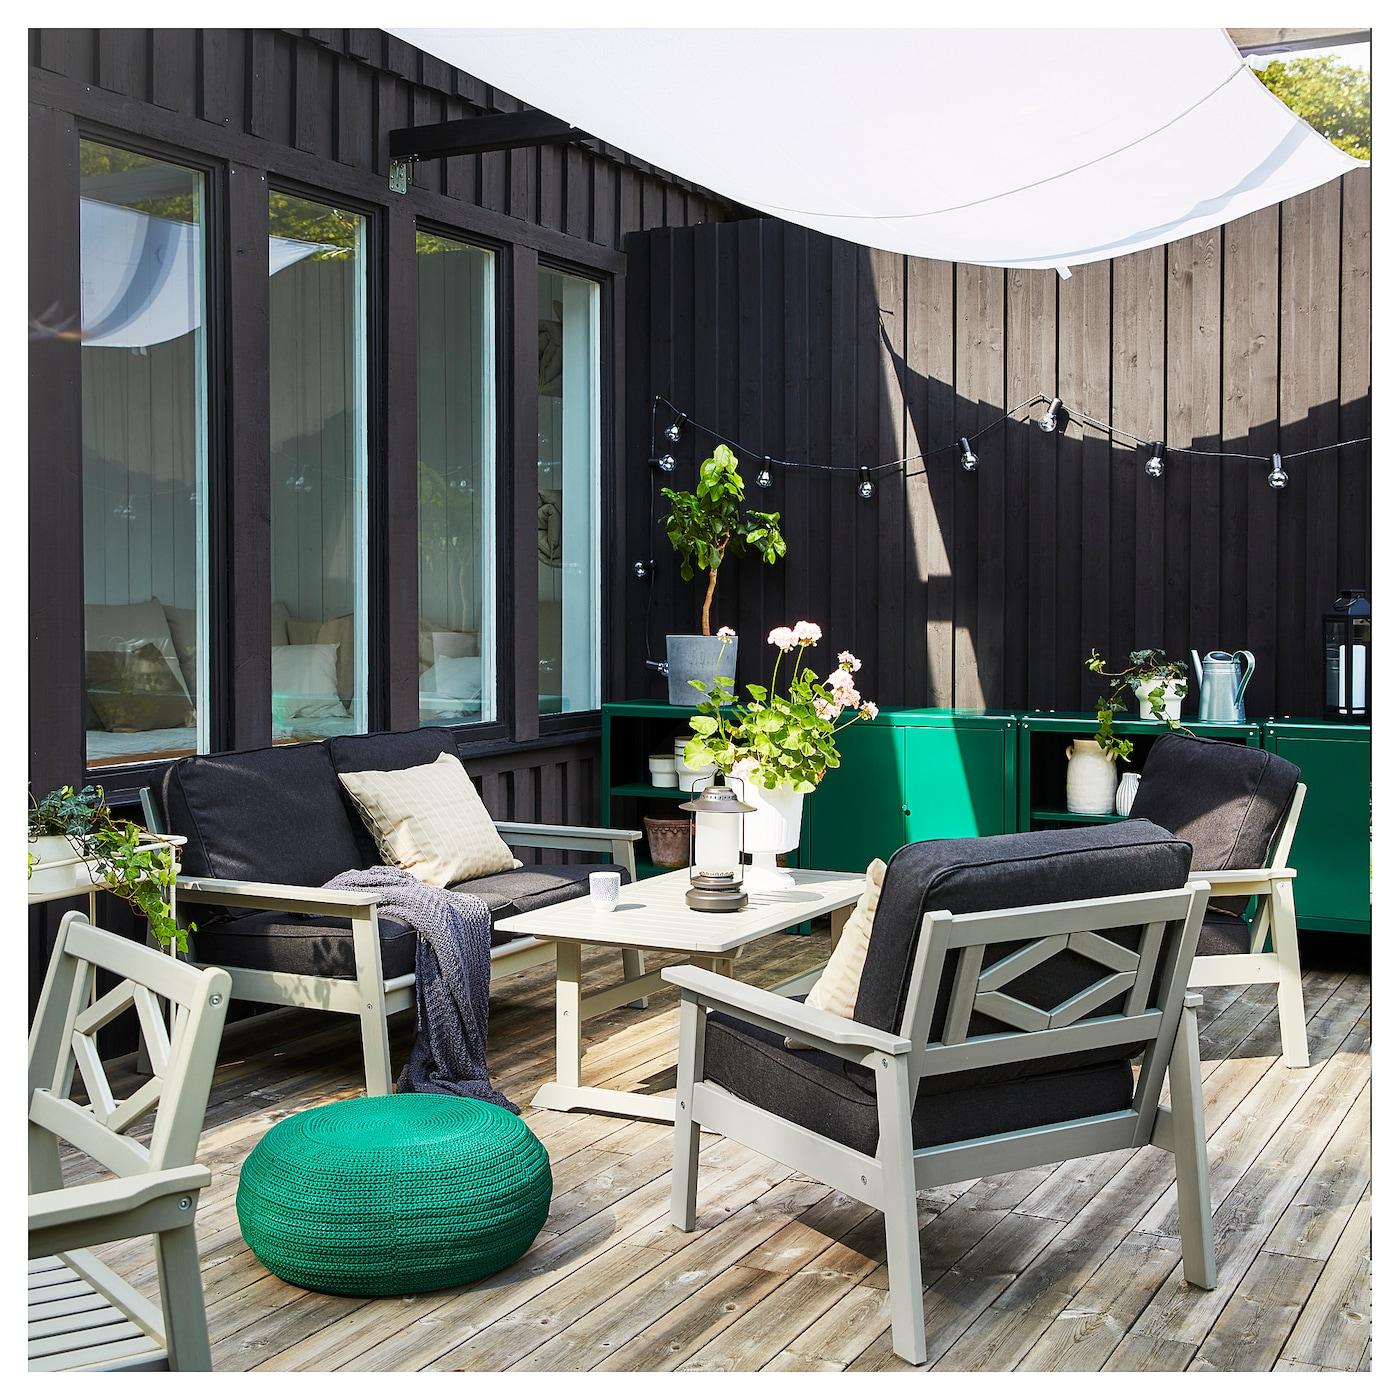 Bondholmen Armchair Outdoor Gray Stained Width 30 3 8 Ikea